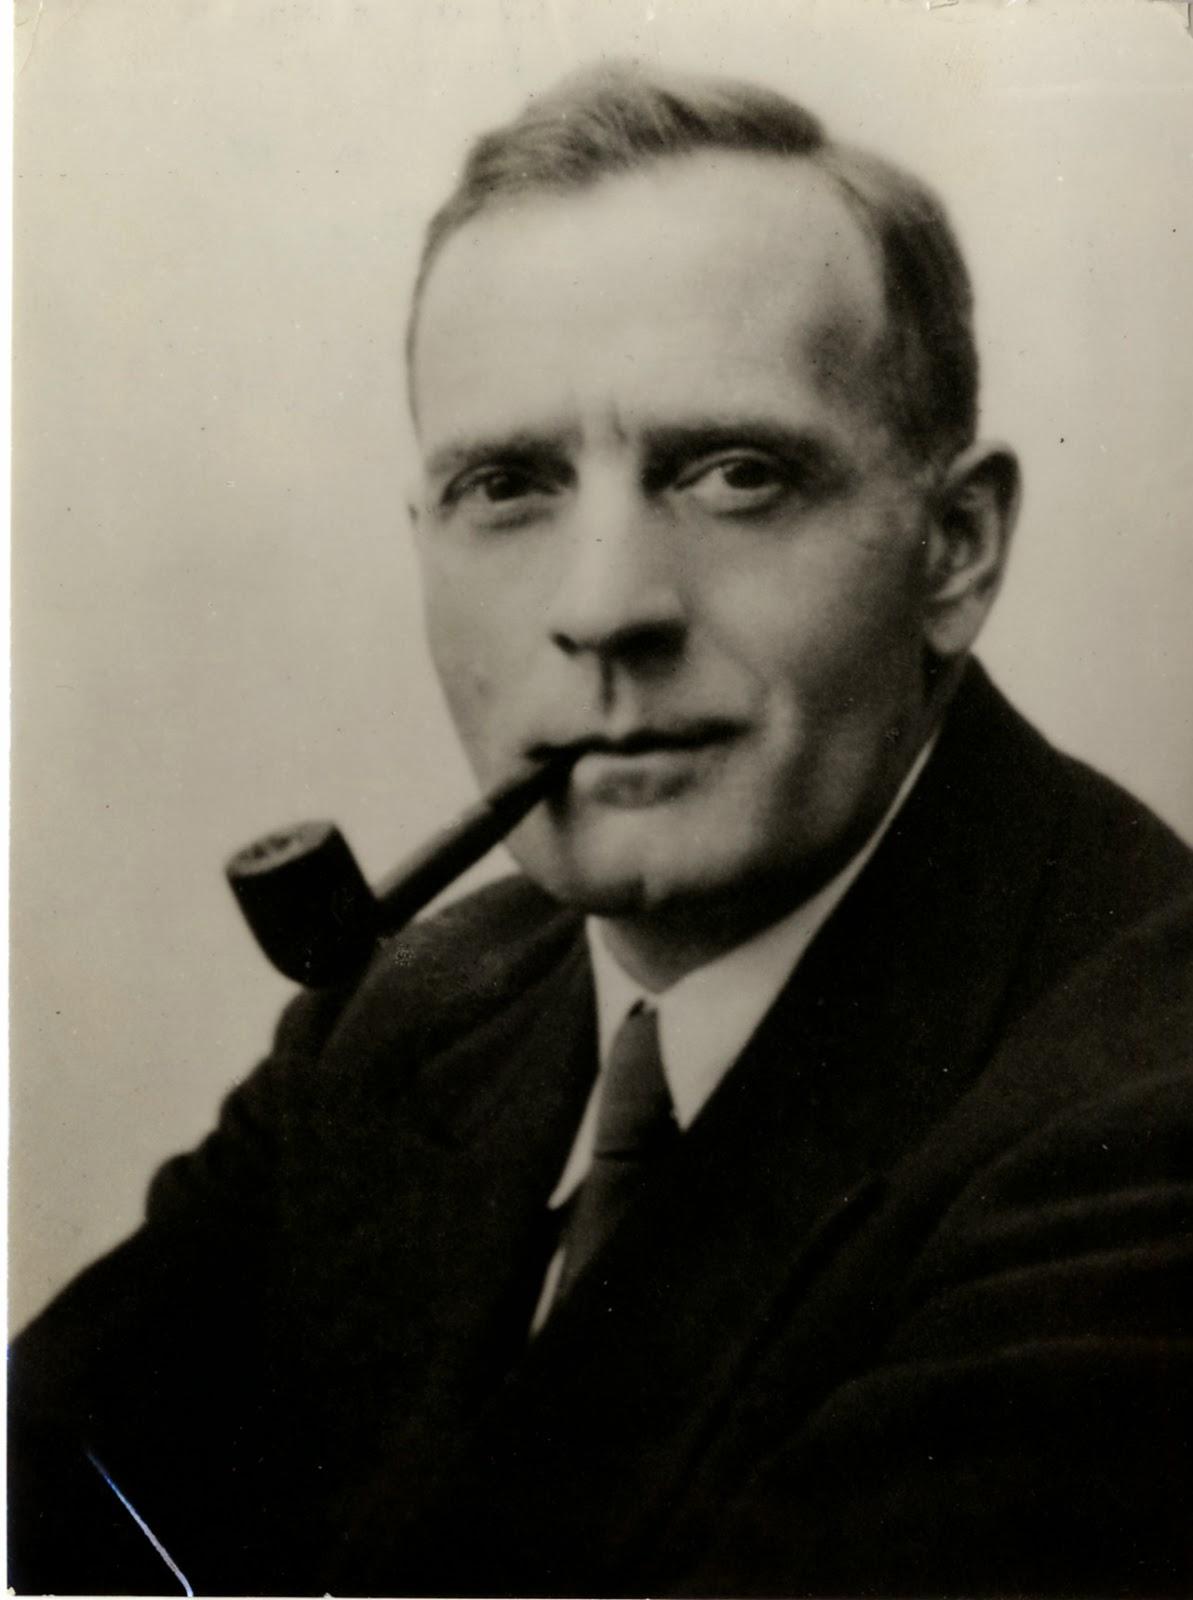 Photograph of Edwin Powell Hubble smoking a pipe